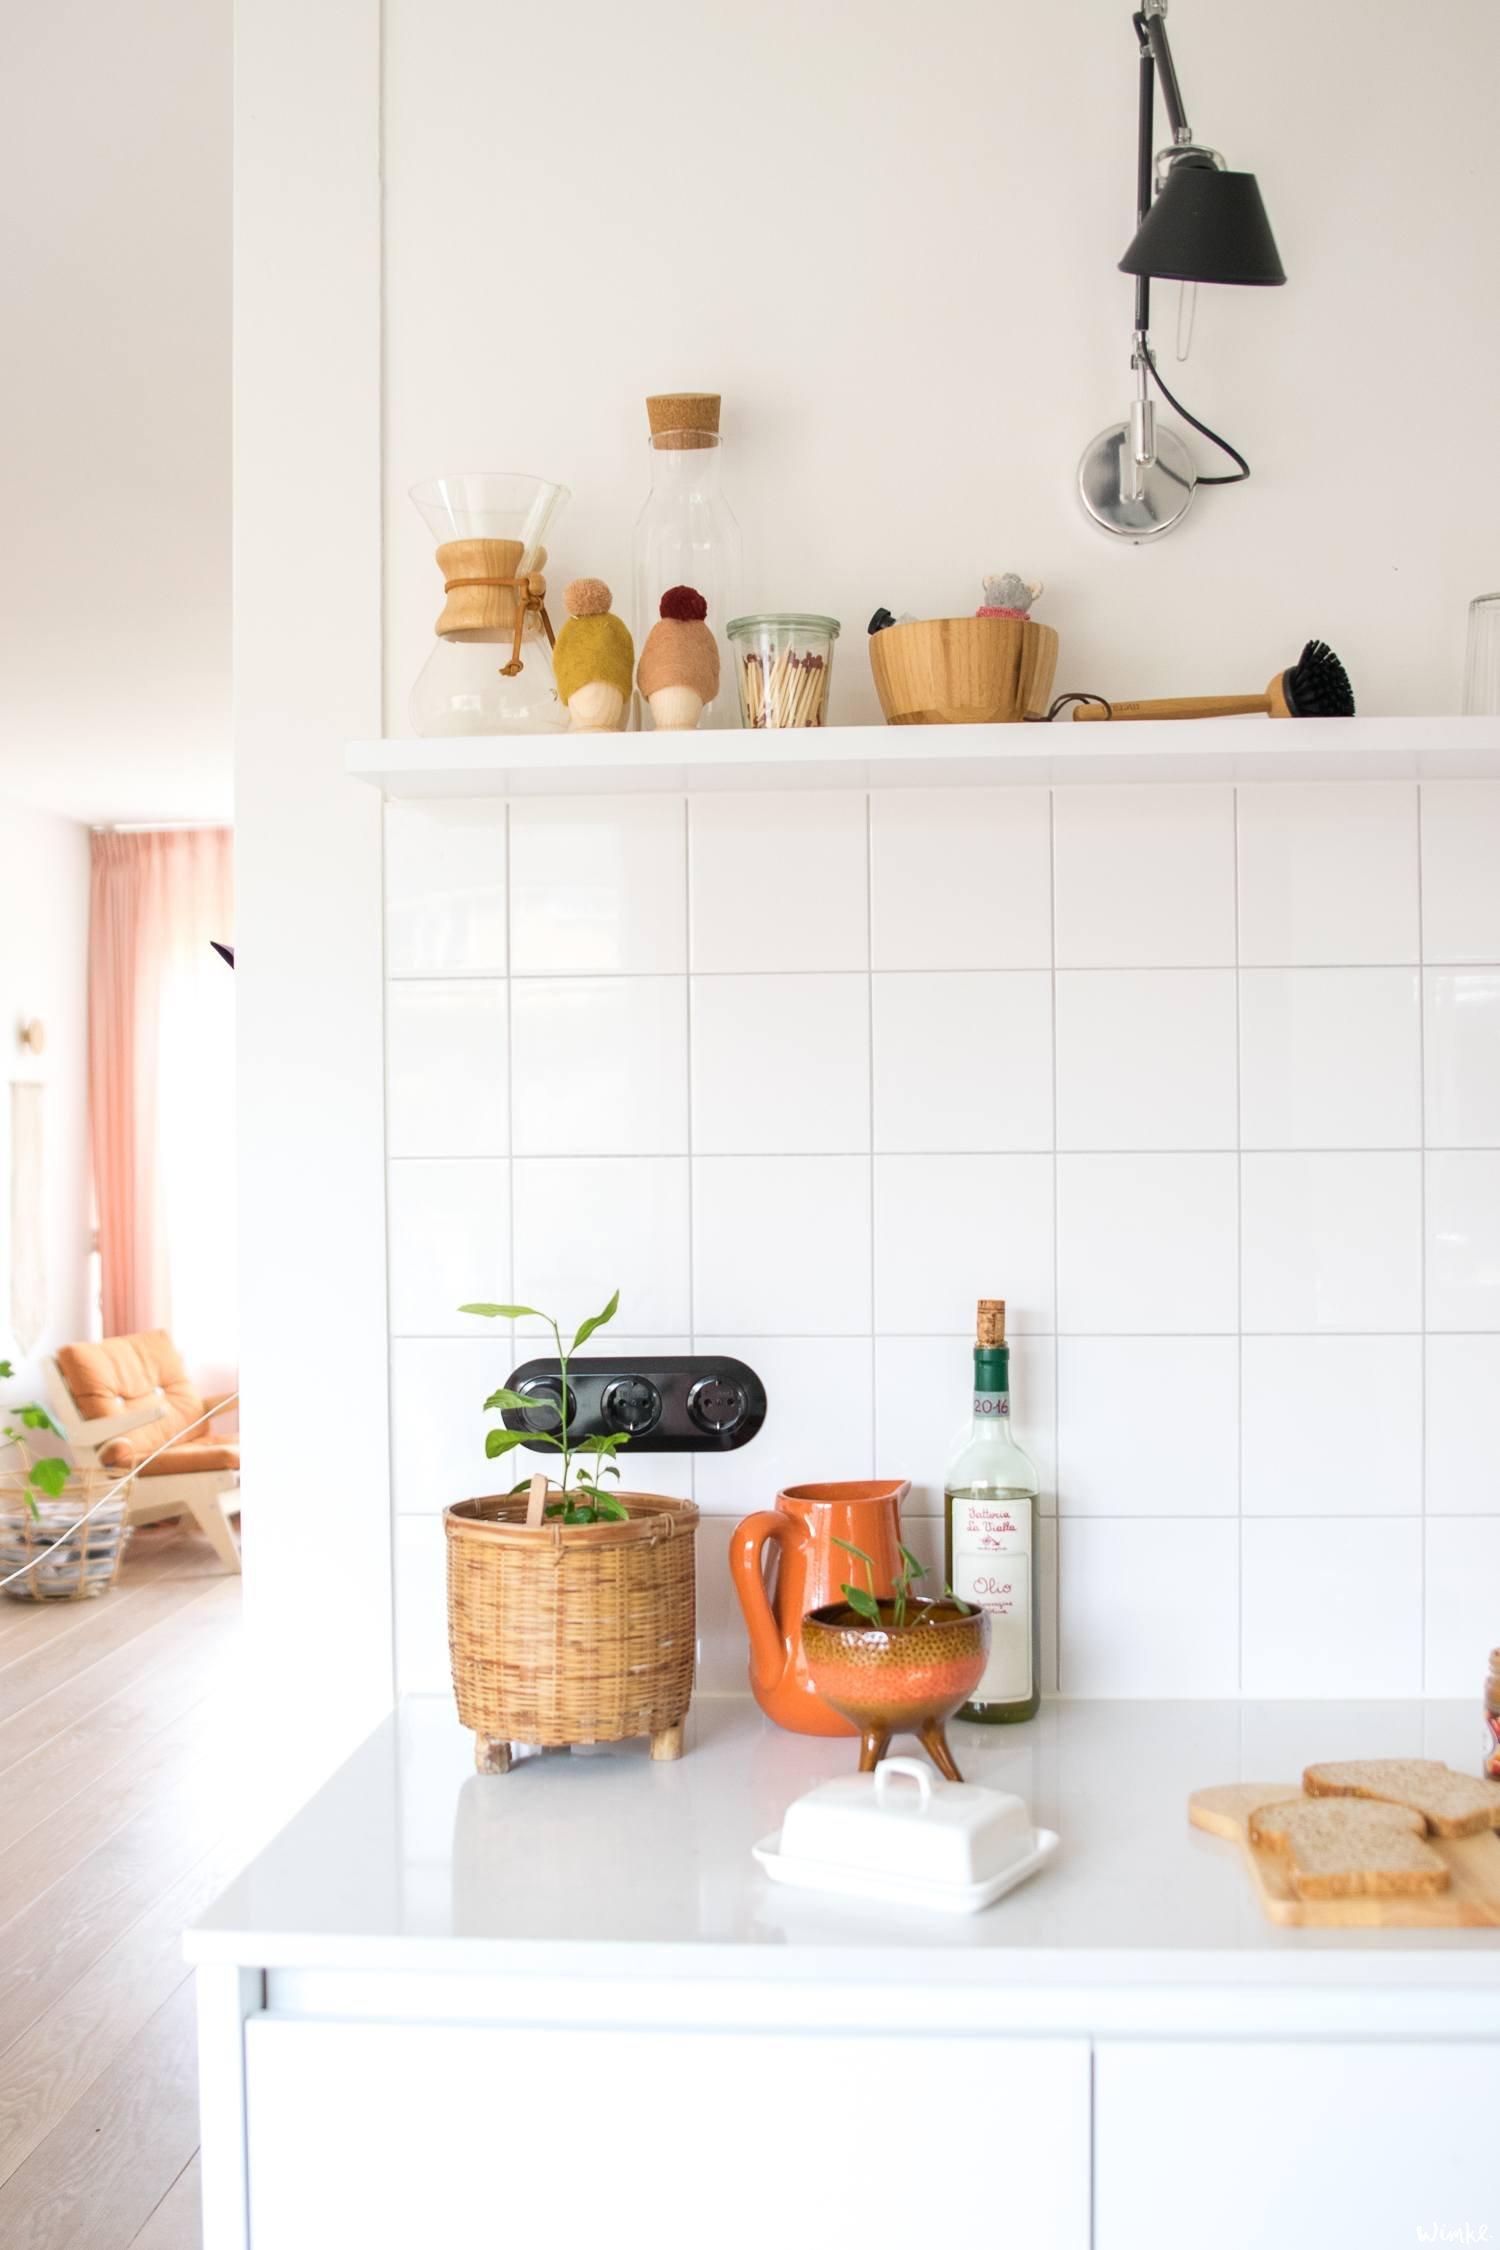 keukenpraat en Saber light letterbox van Zuiver - www.wimke.nl